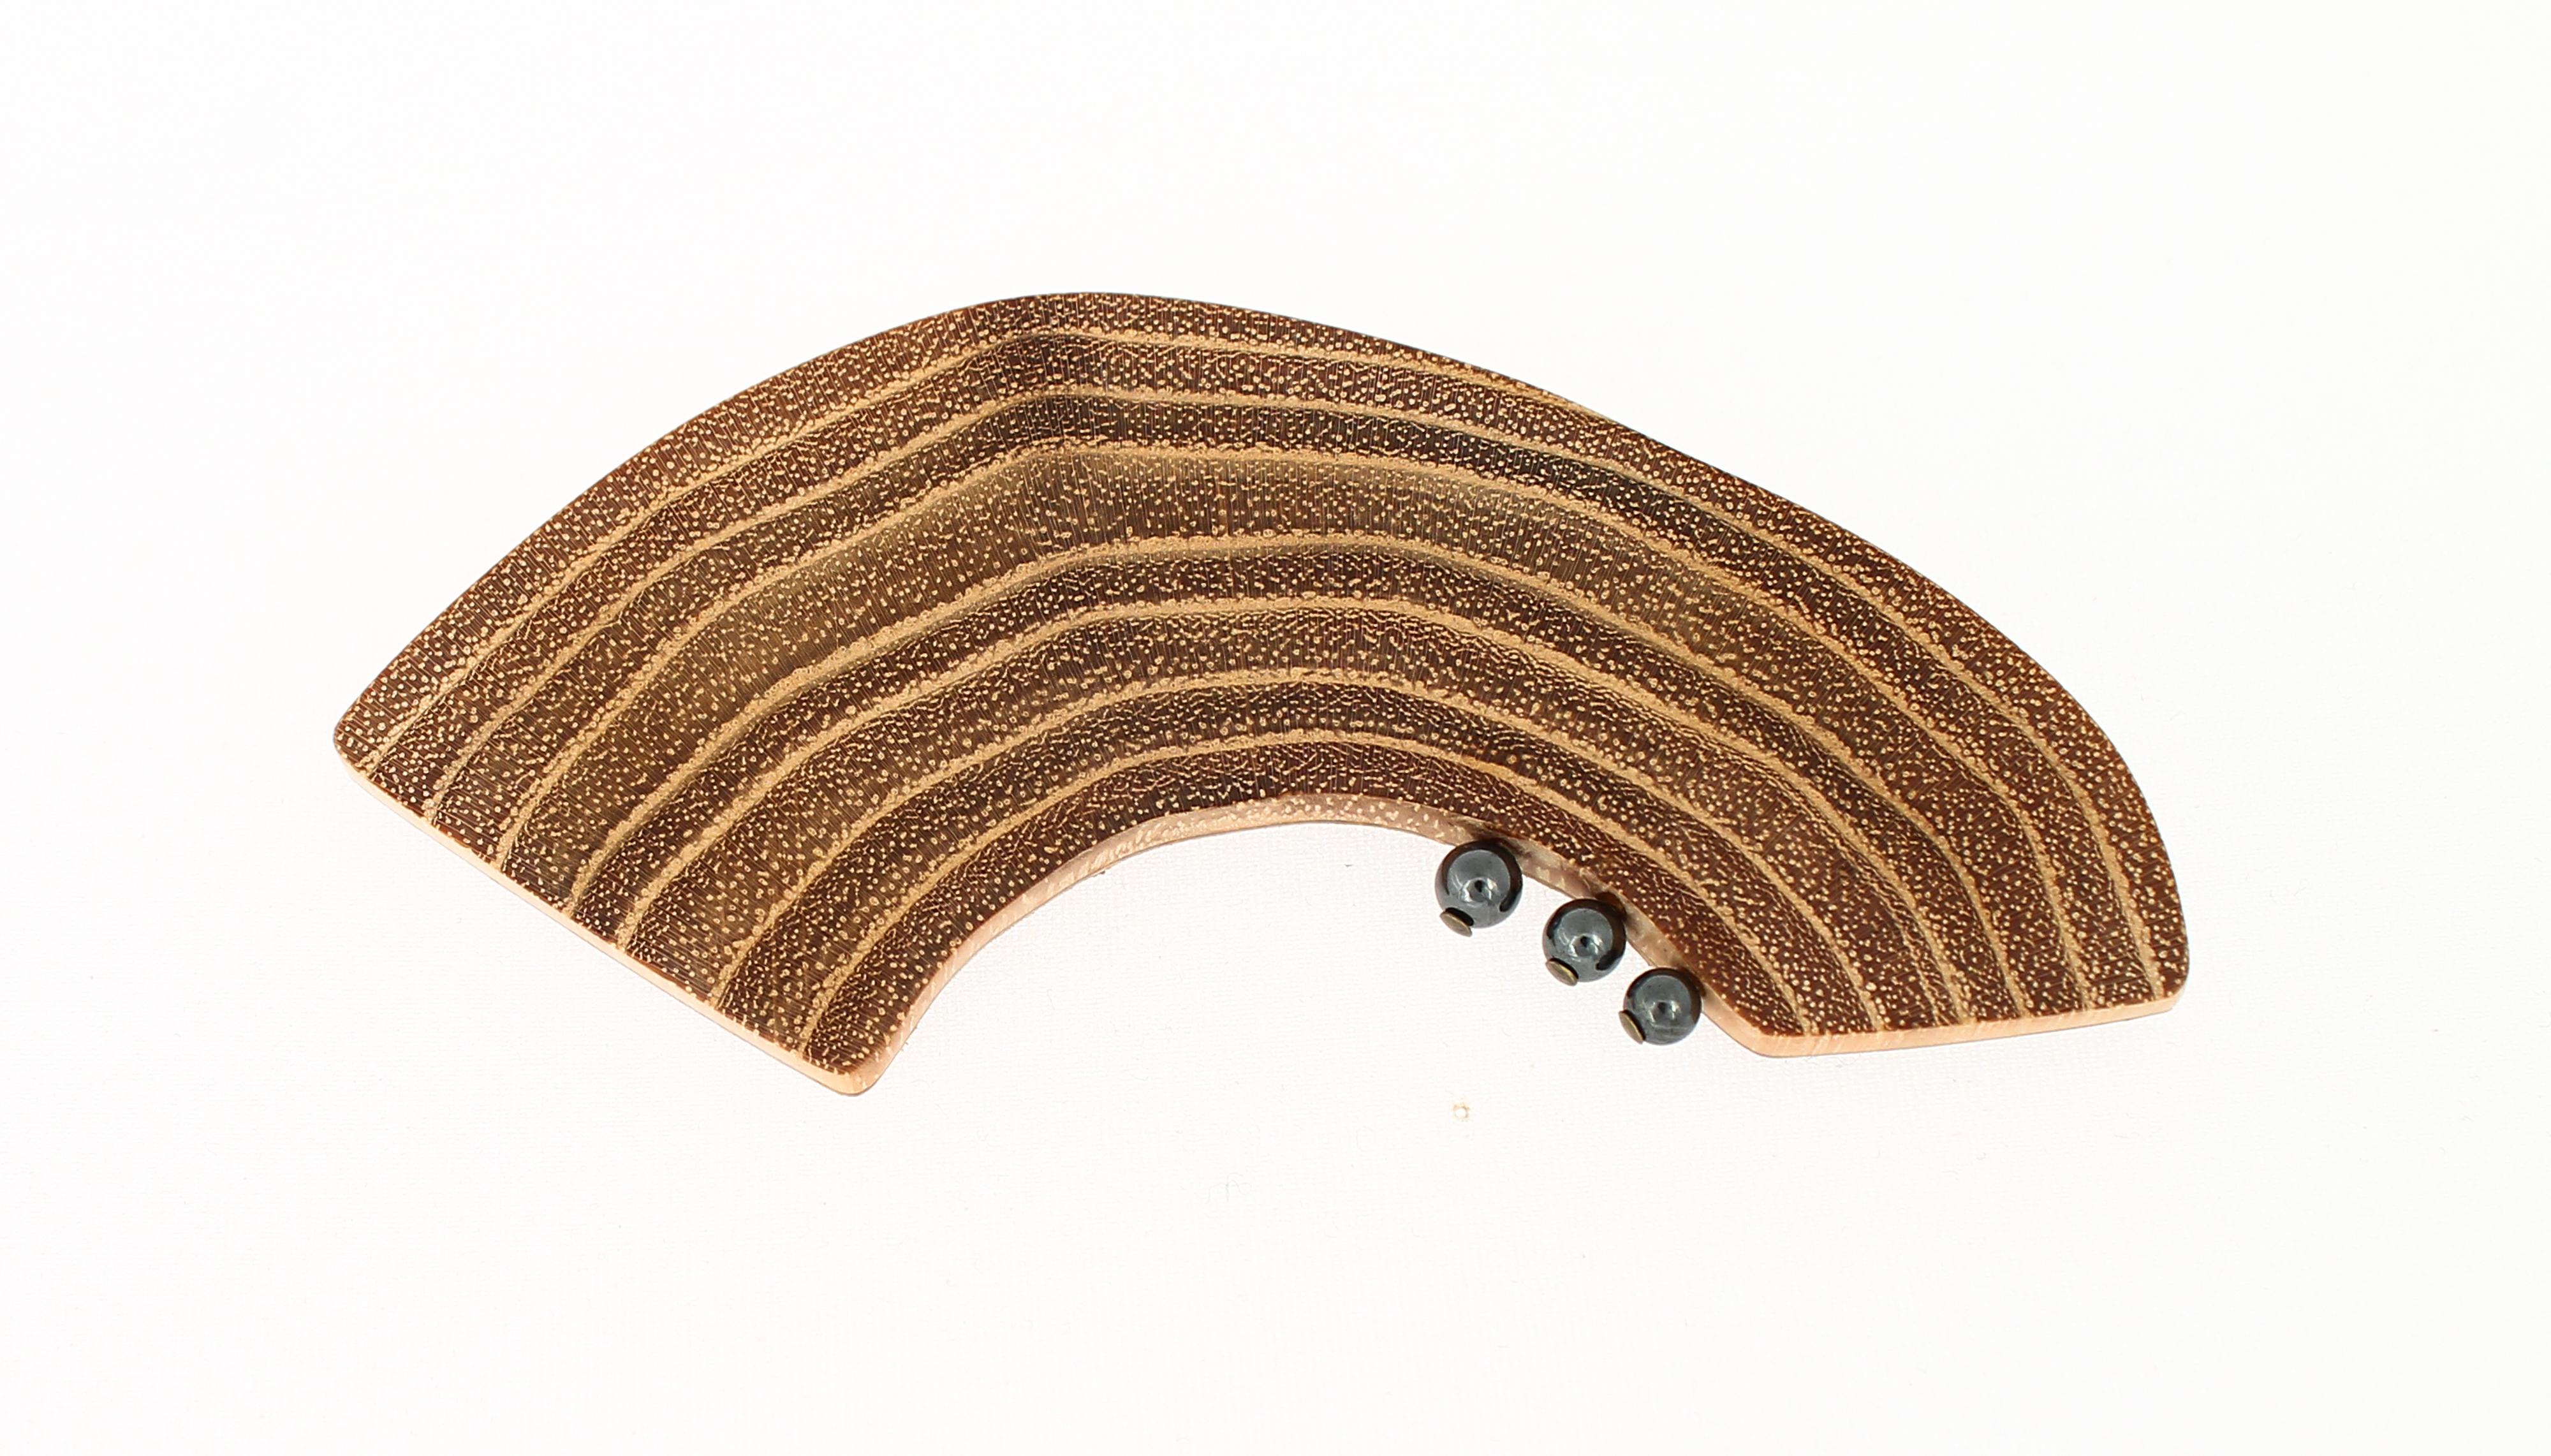 black locust hematite brooch